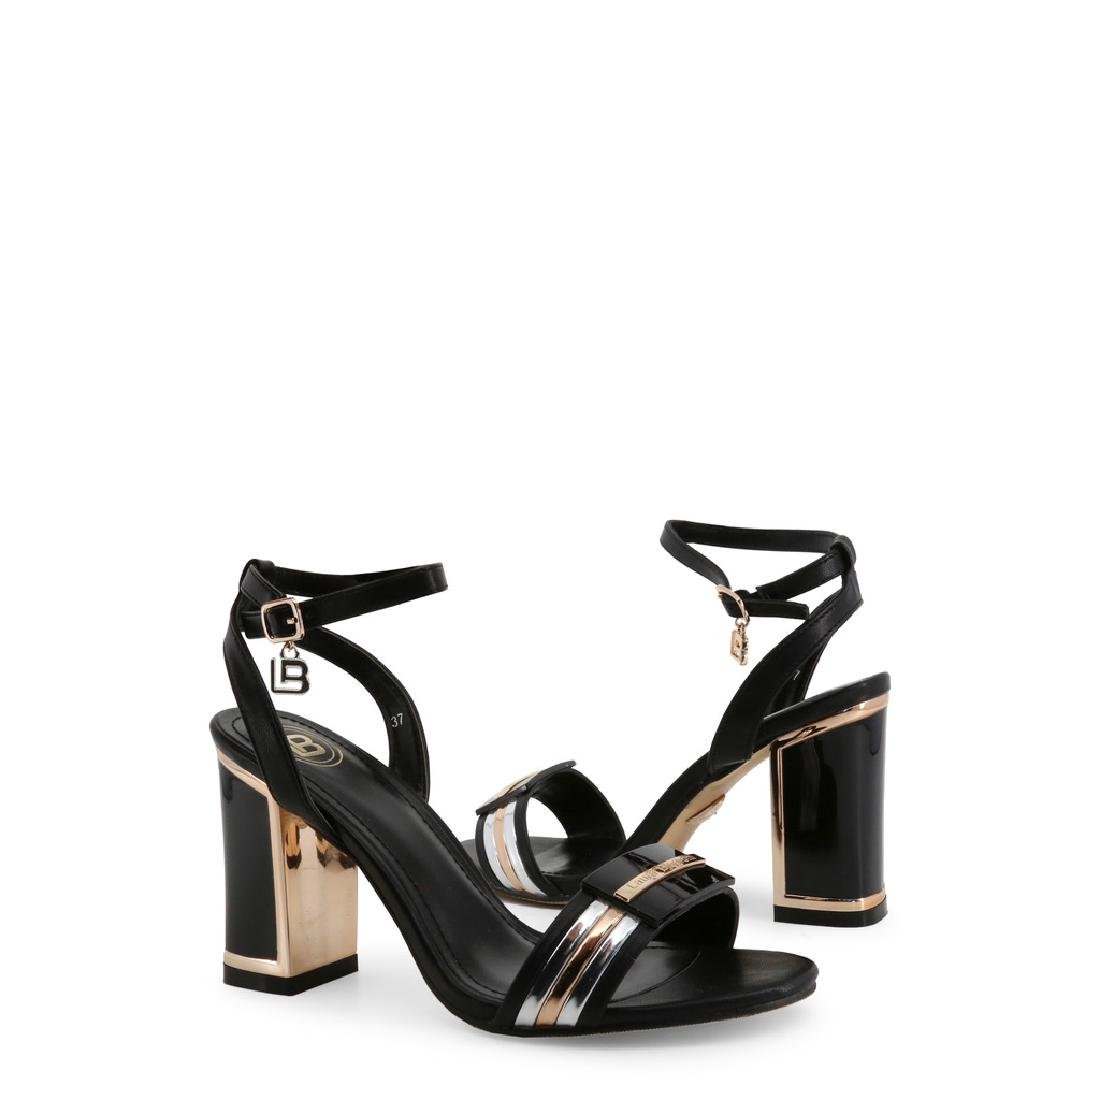 Laura Biagiotti Italian Designer High Heel Sandals EUR